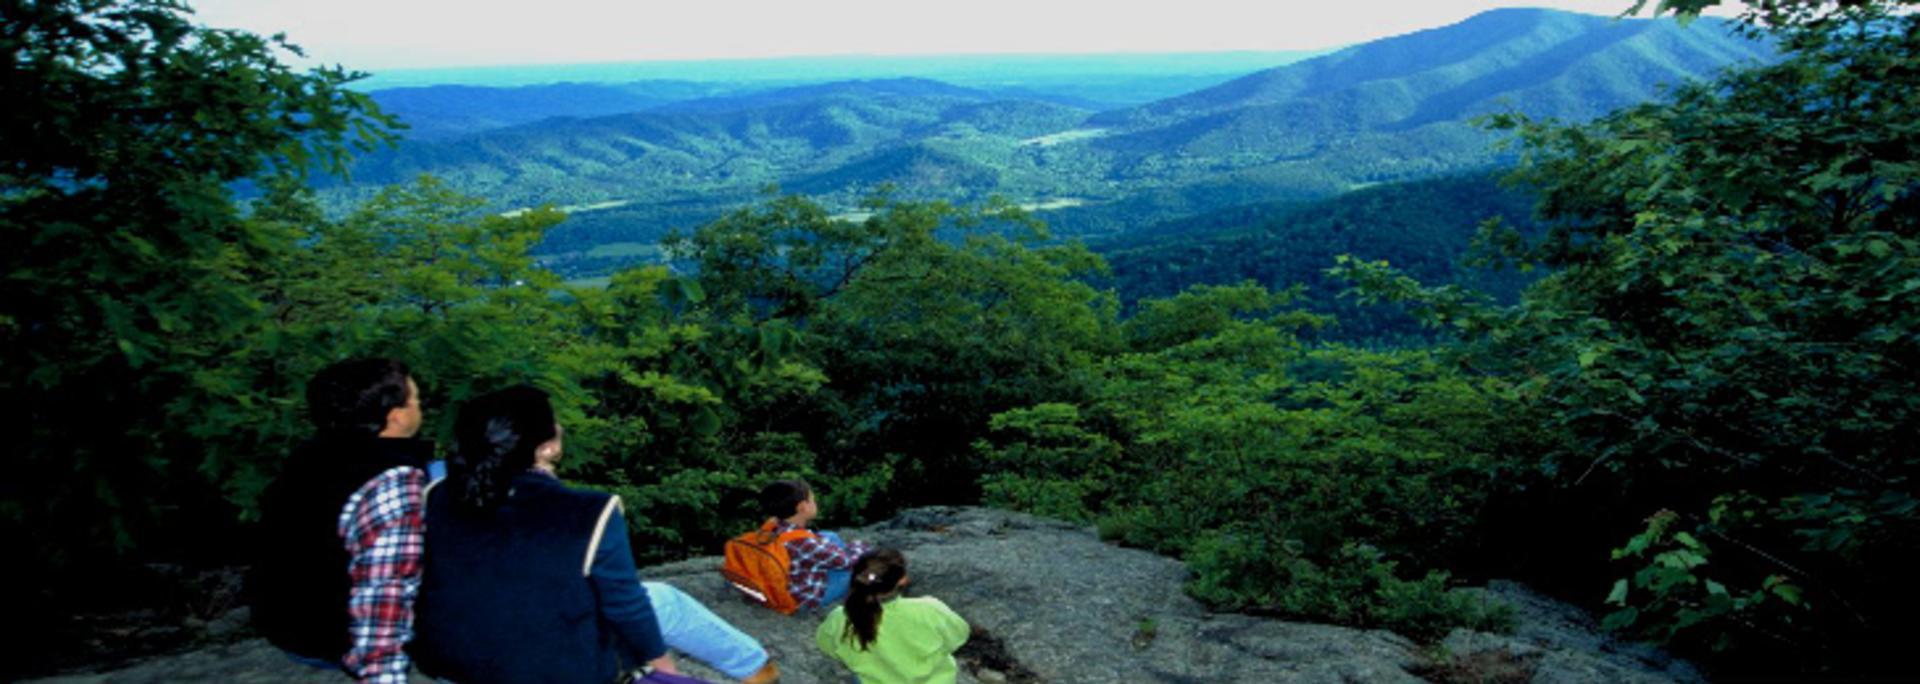 Family Overlook Mountains 2